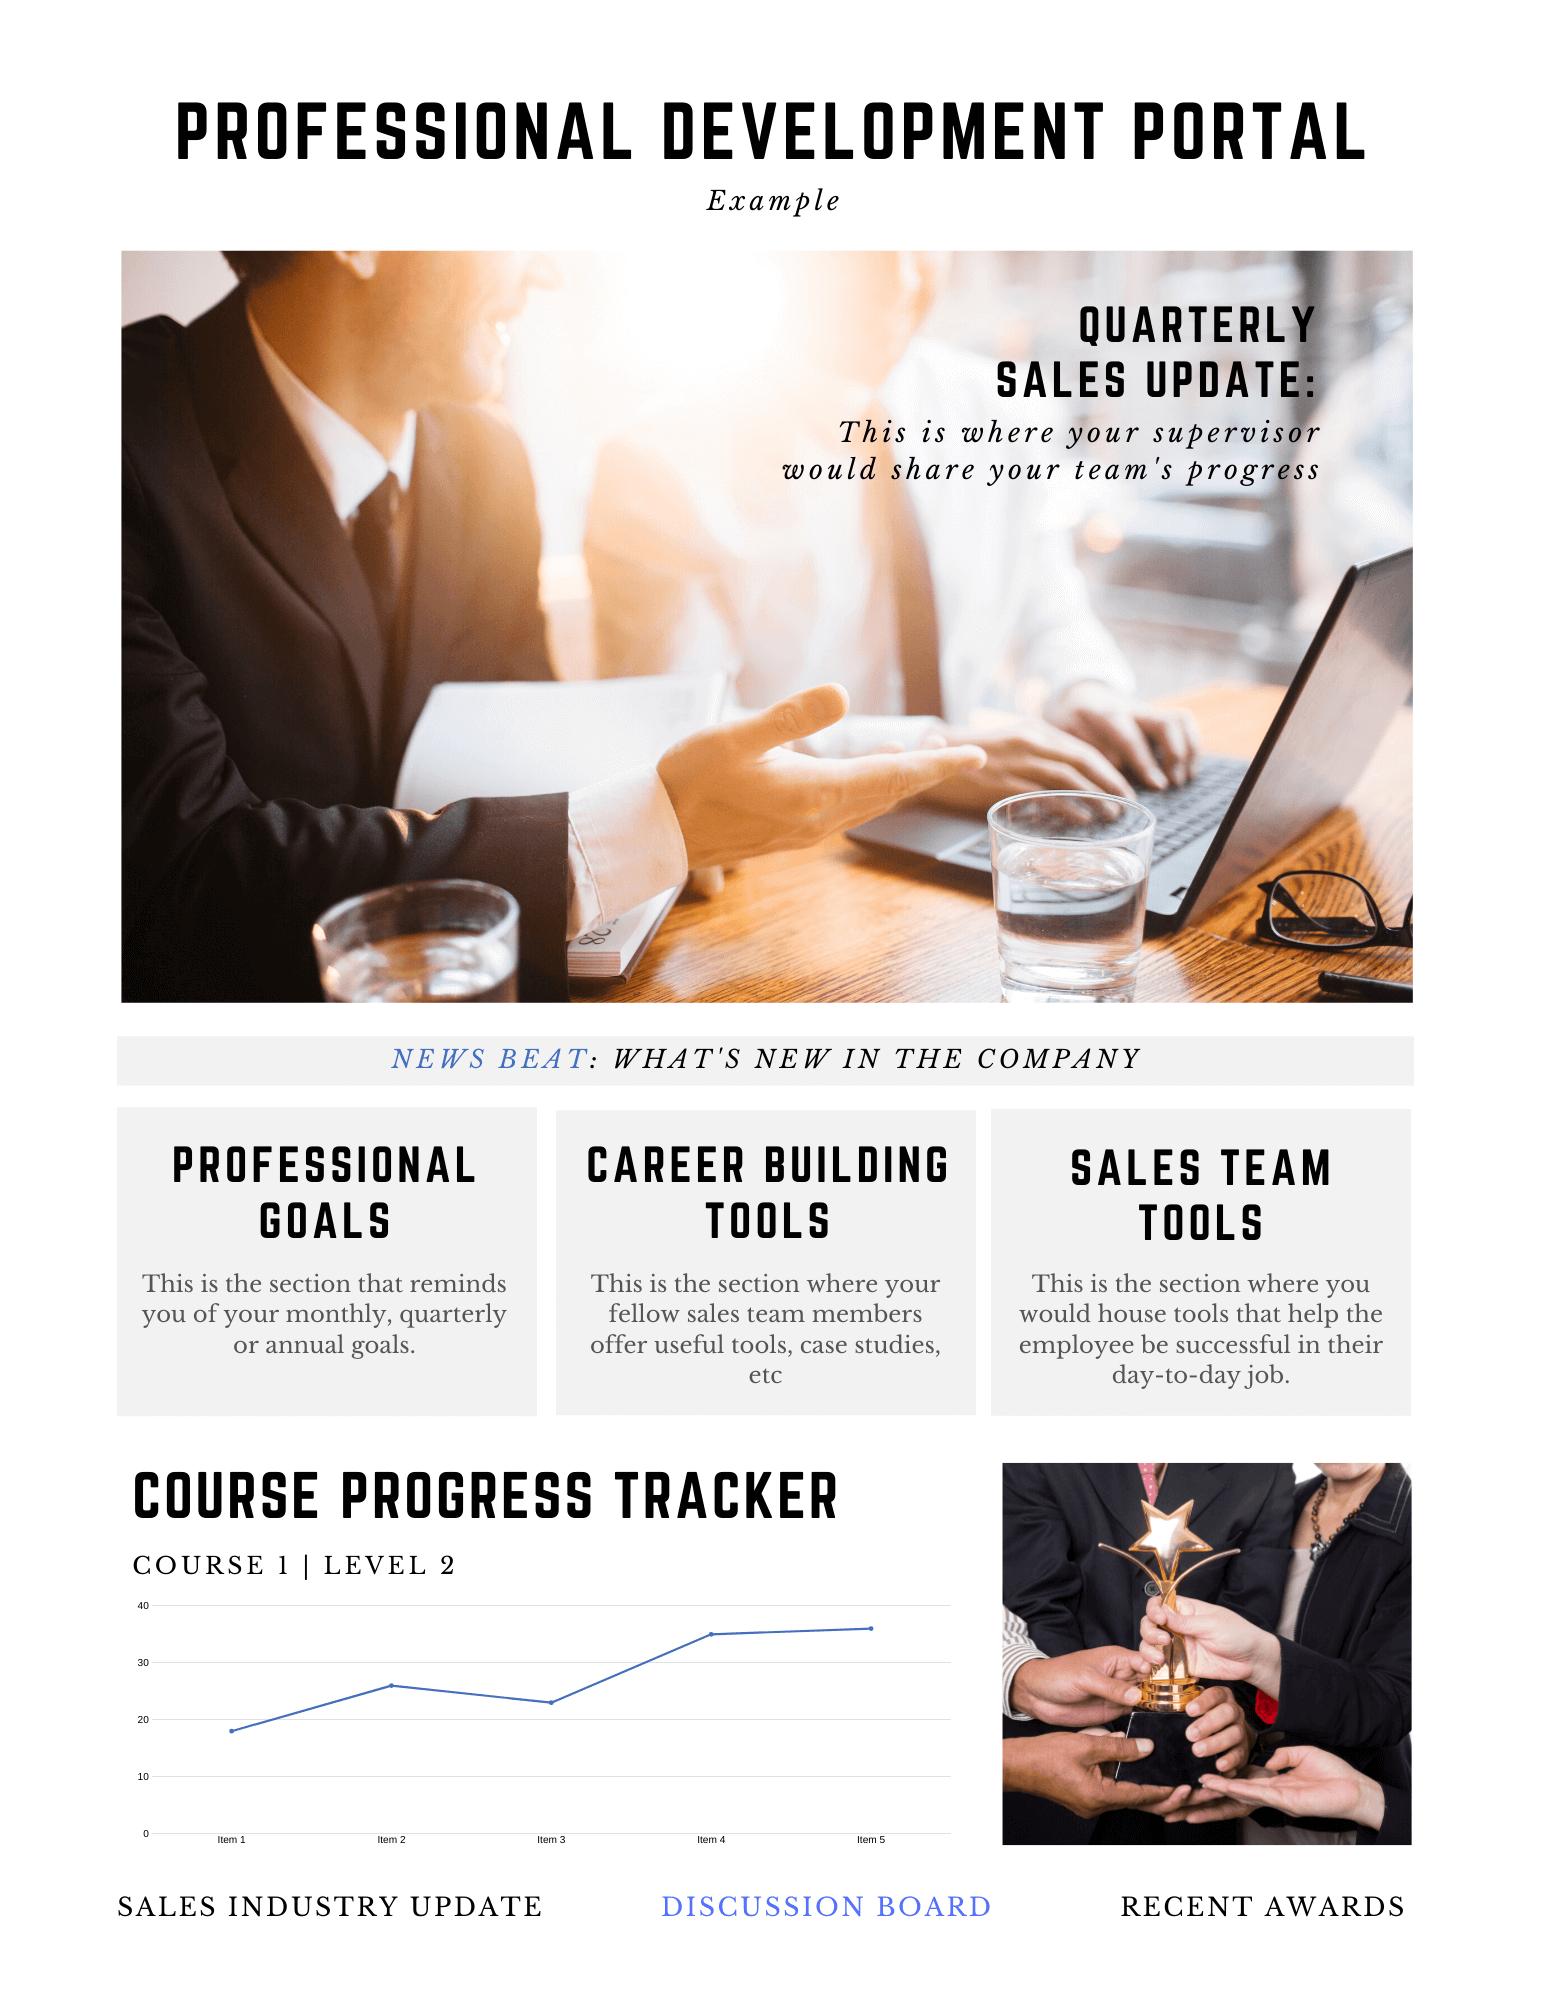 Professional development portal examples